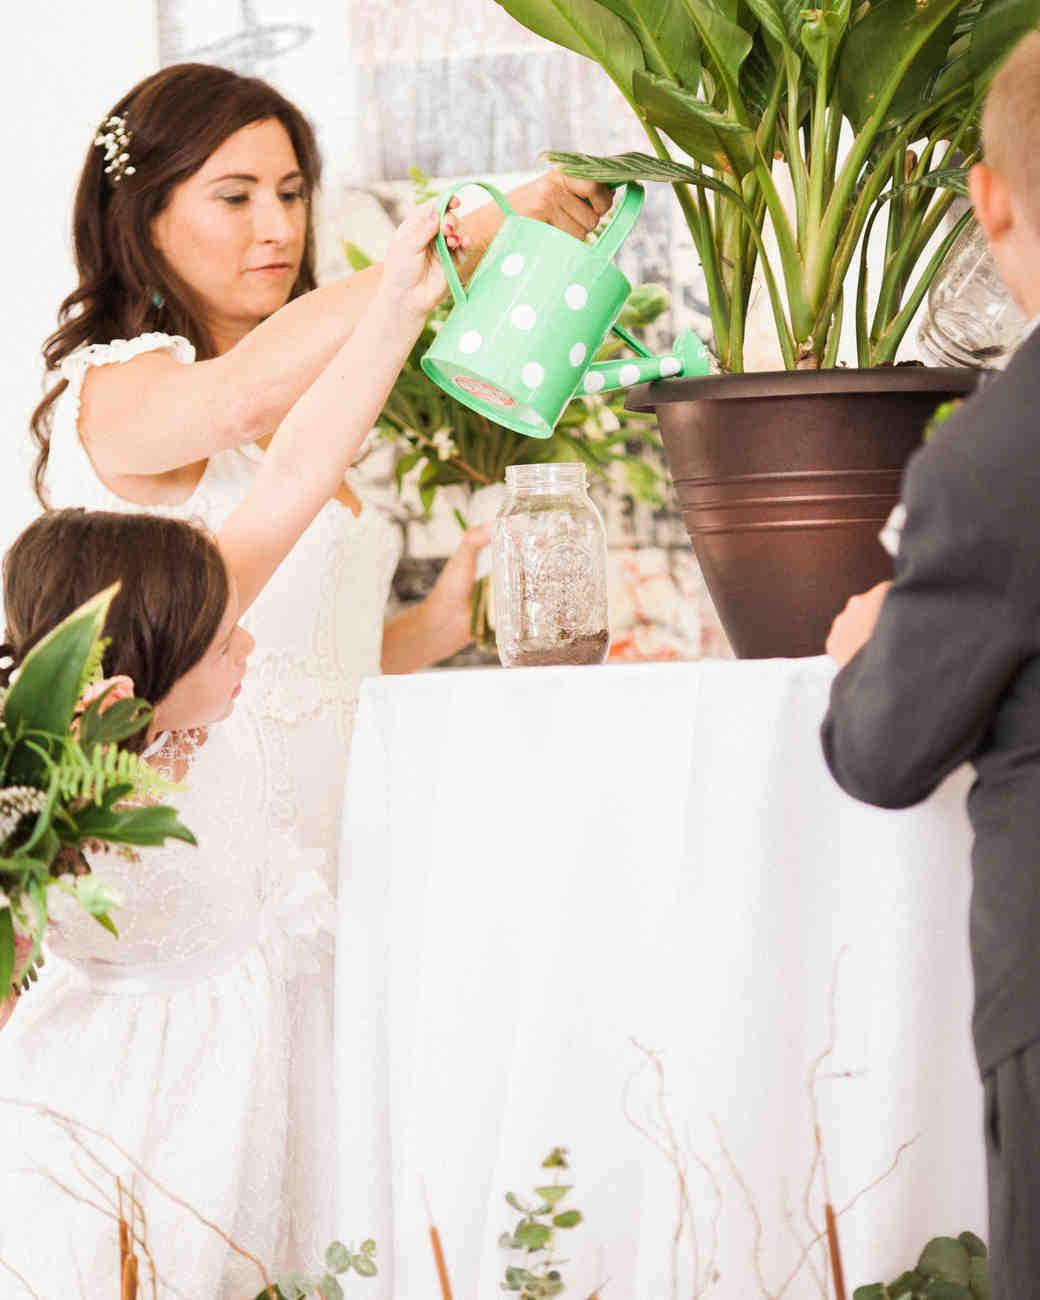 sydney-mike-wedding-ceremony-9-s111778-0215.jpg